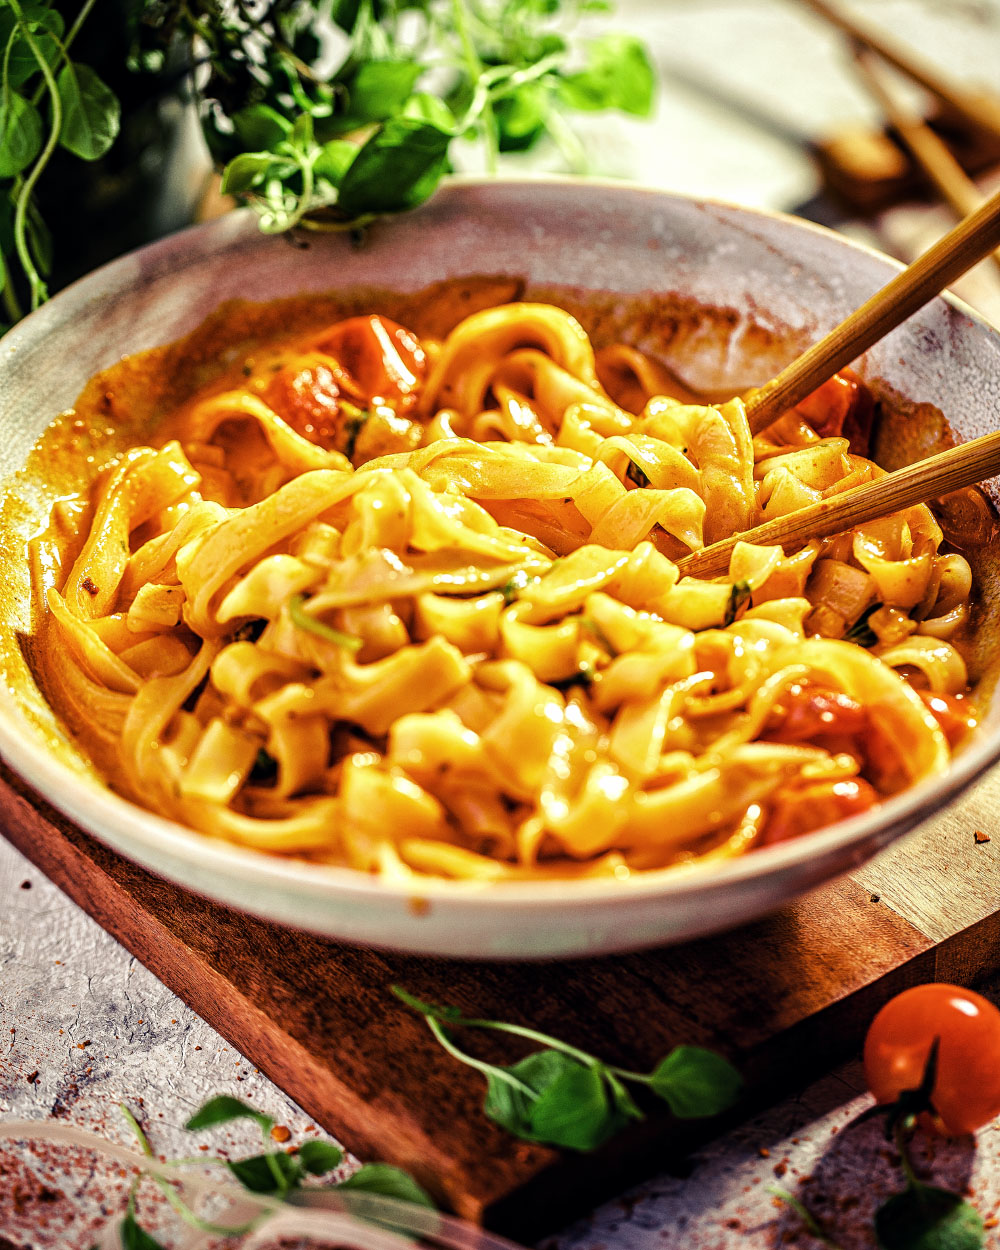 Cremige Thai-Nudeln - nudeln reishunger currySchnelle Thai Creme-nudeln reishunger curry